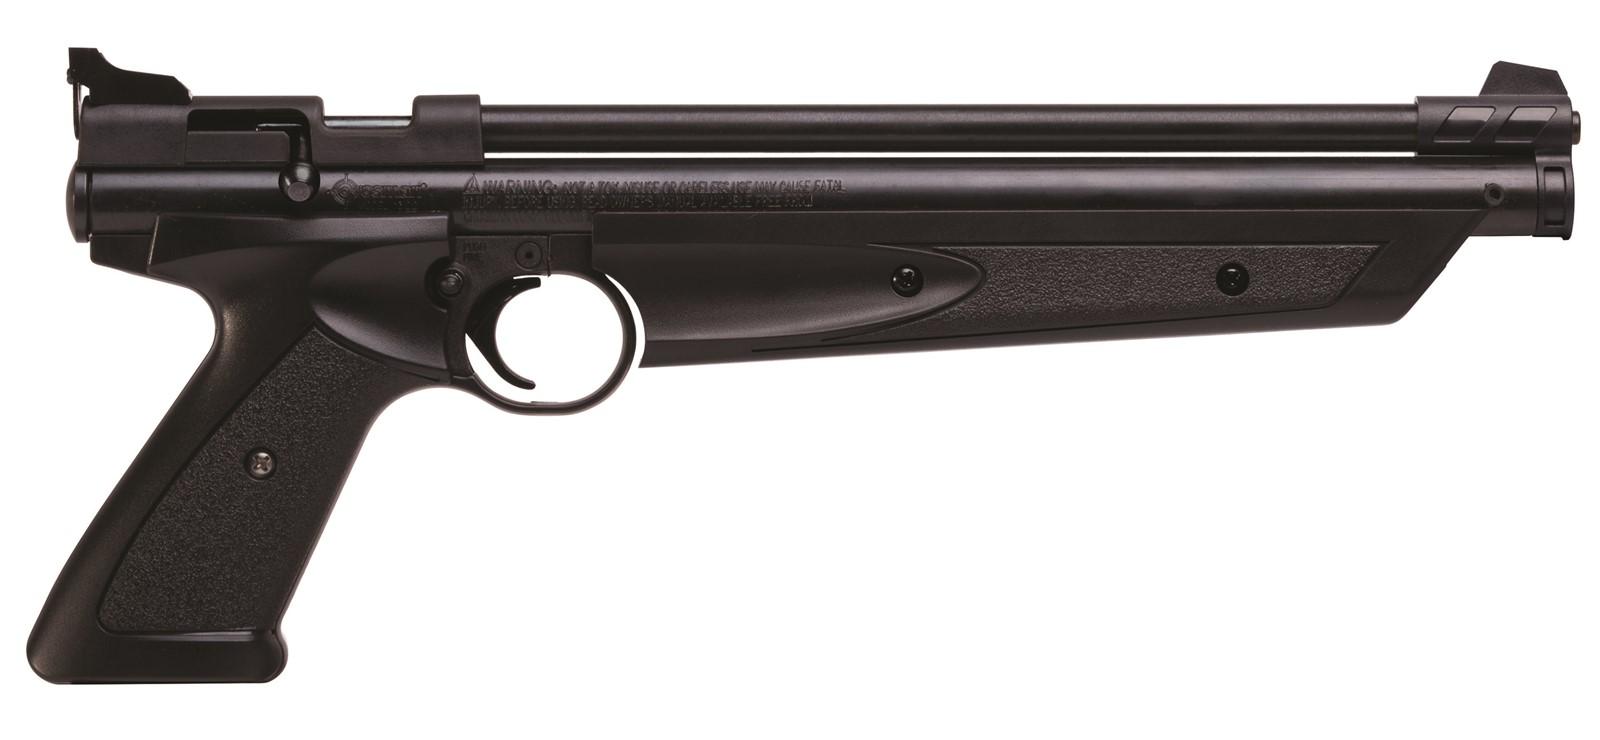 Crosman 1377 Pistol.